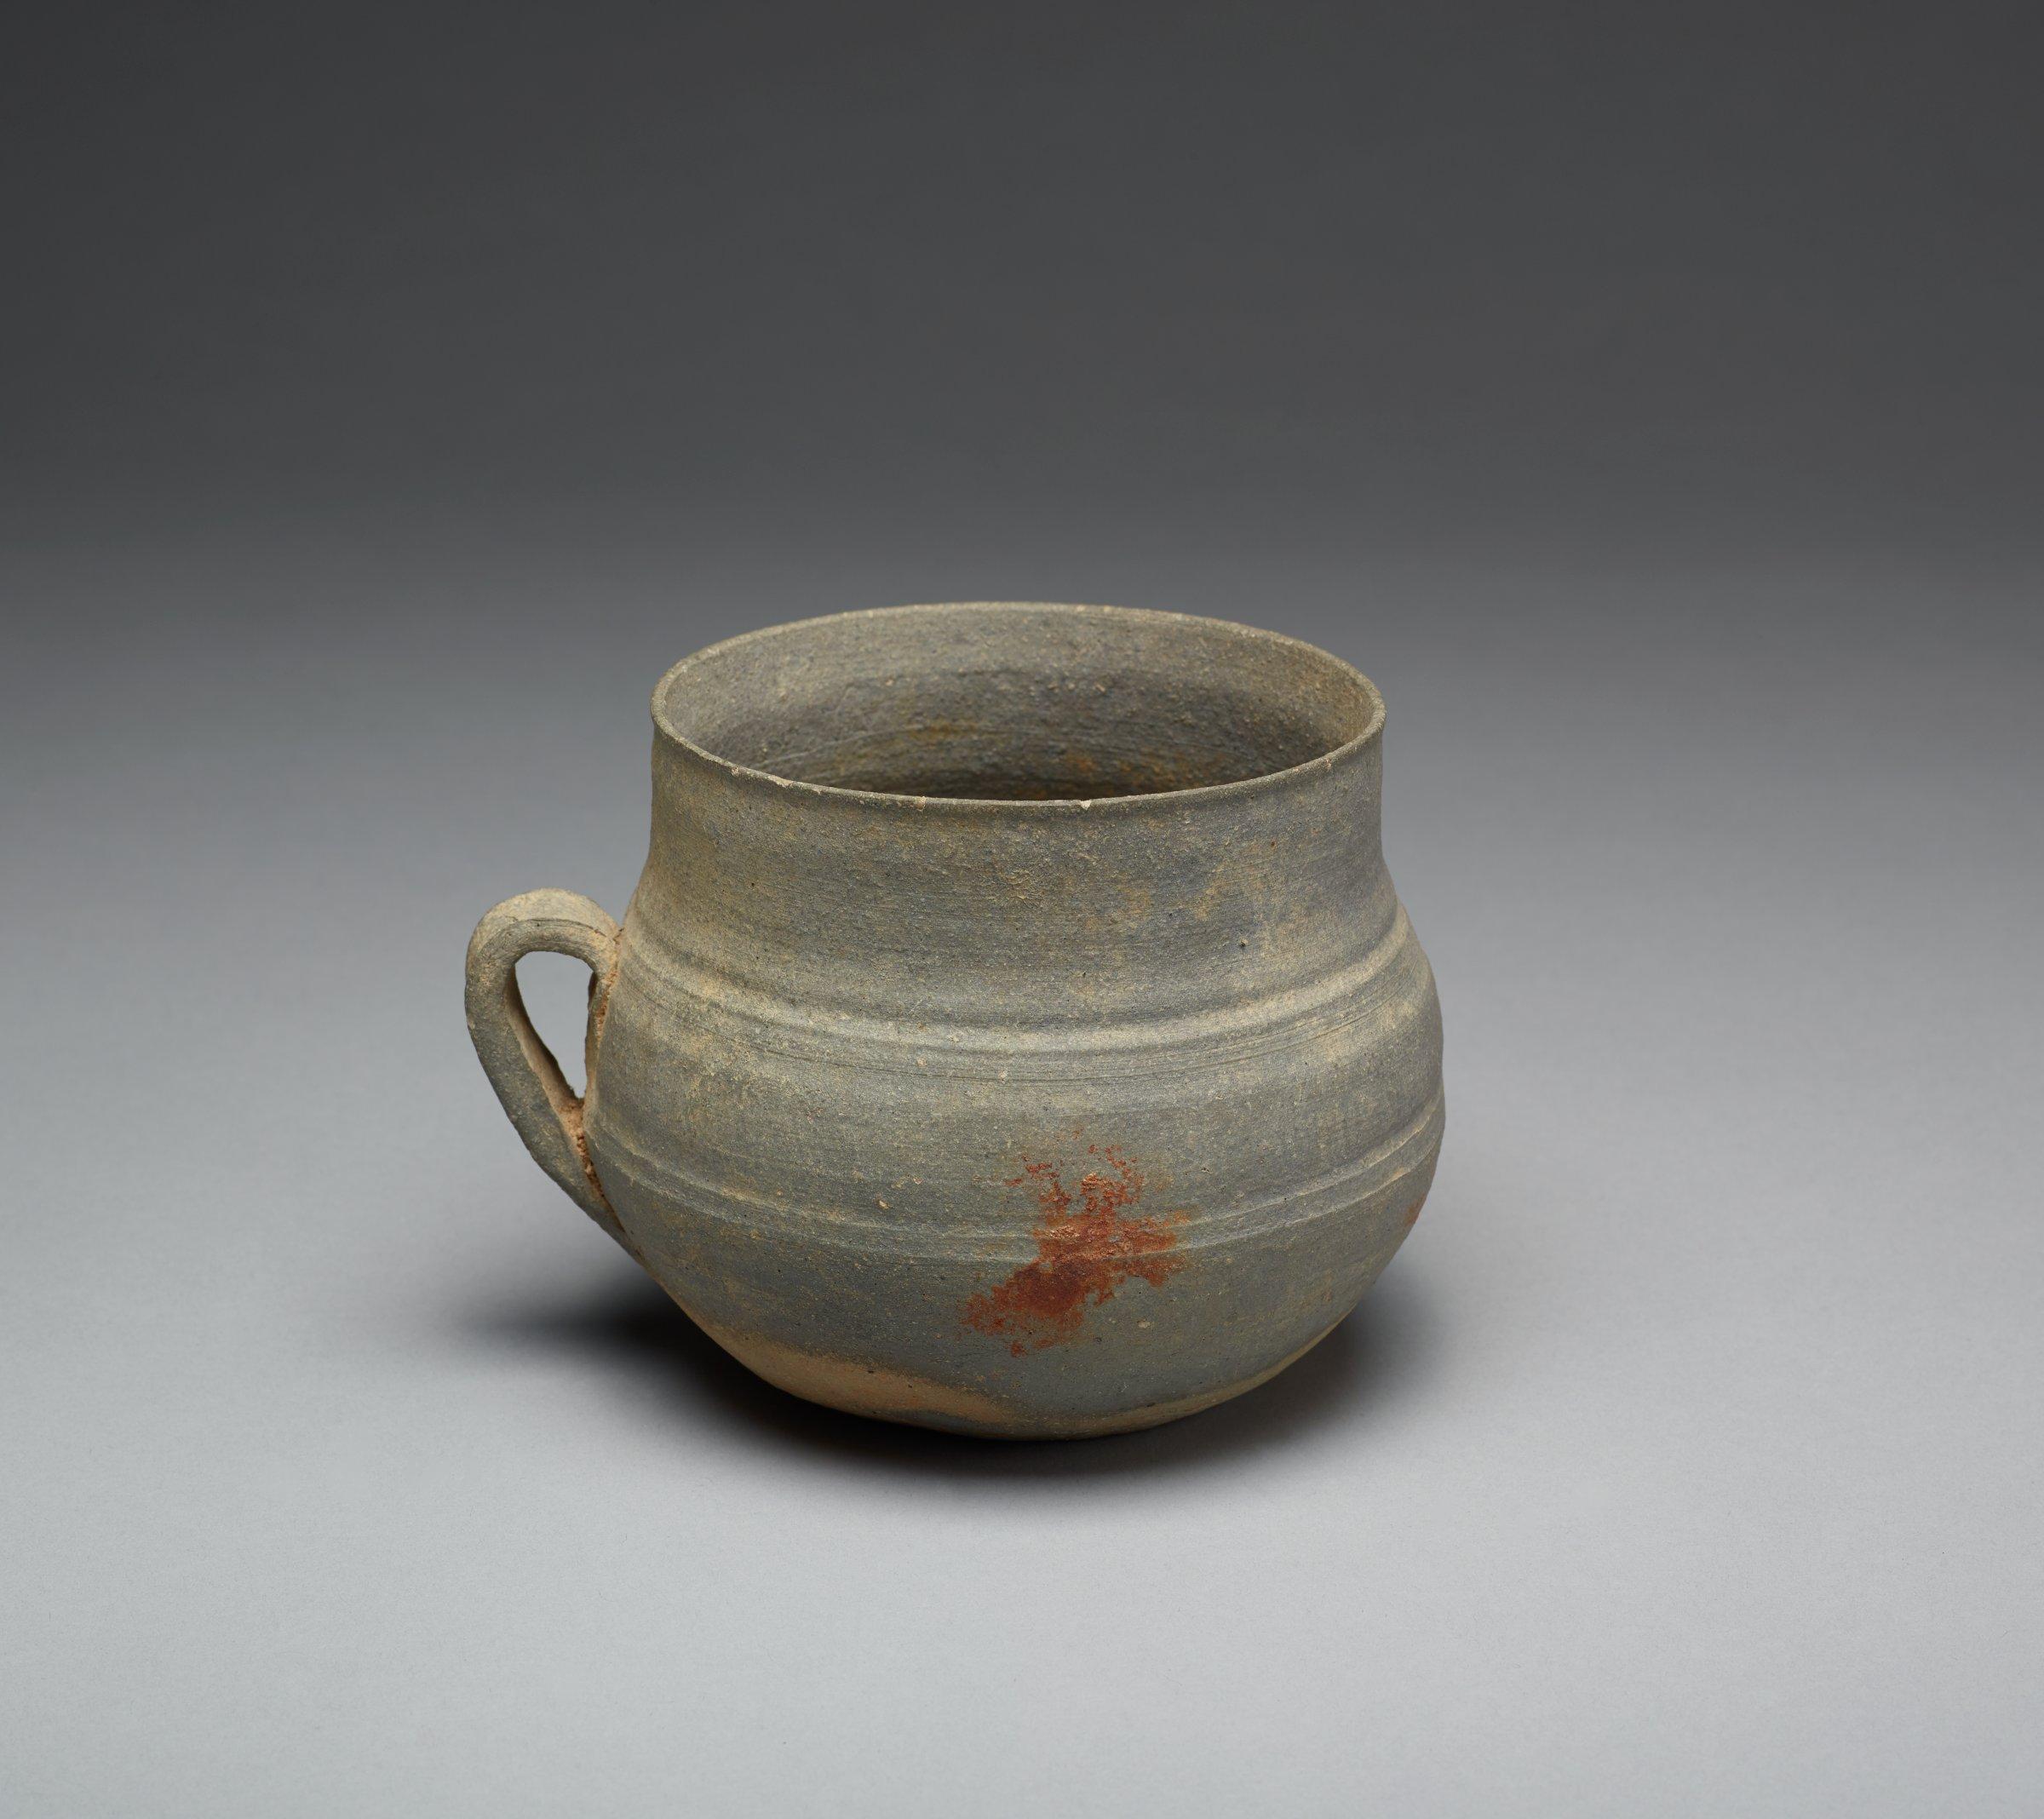 Handled Cup, Korea, stoneware